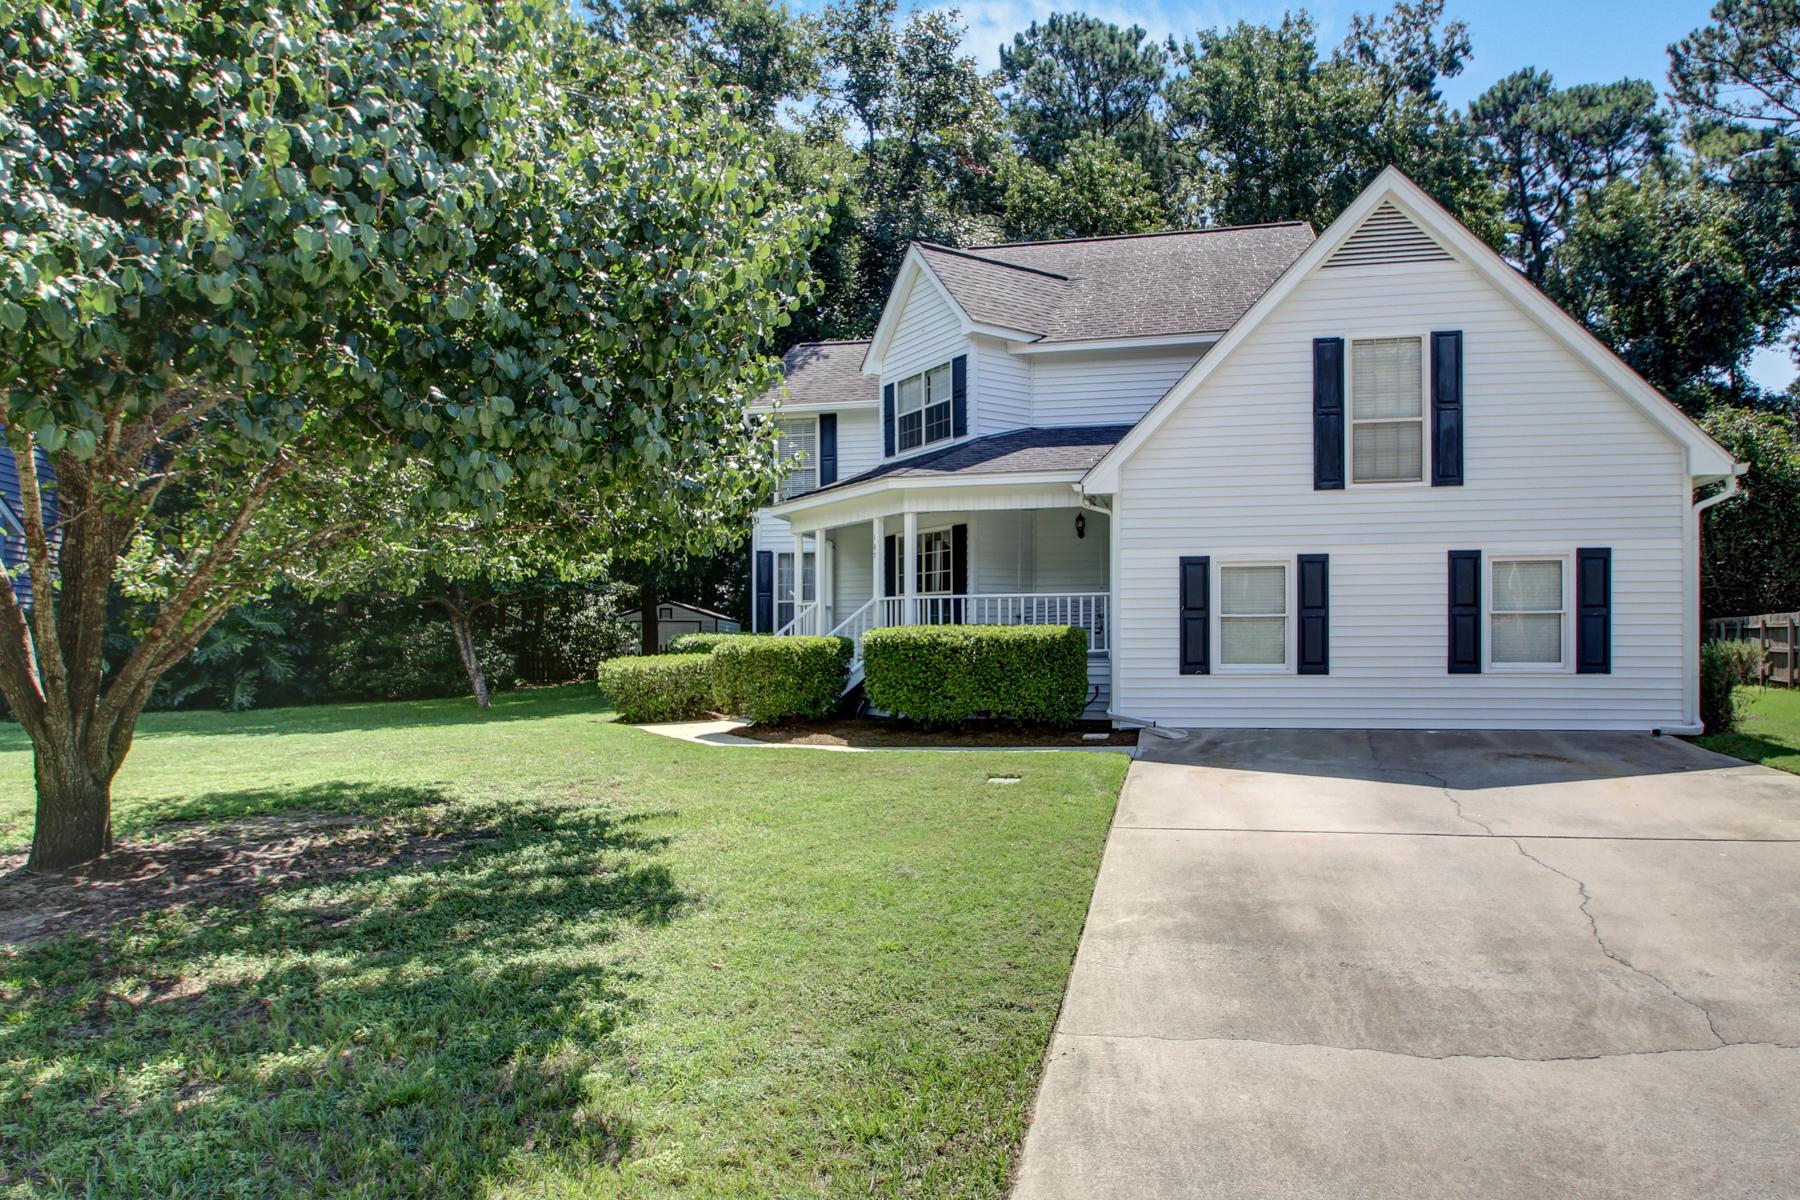 Single Family Home for Sale at 107 Coquena Circle Savannah, Georgia 31410 United States